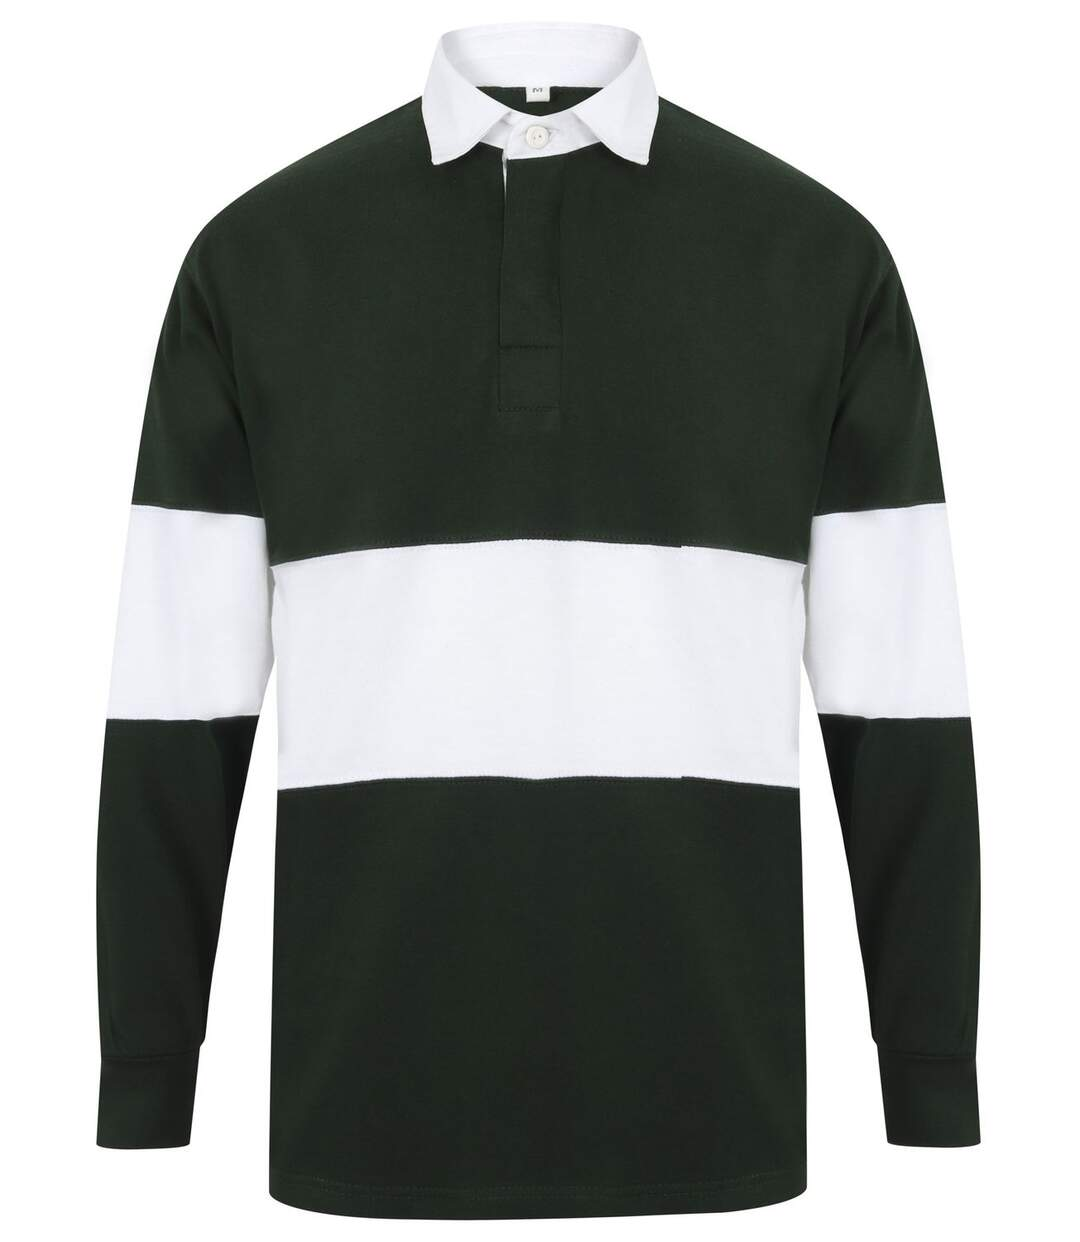 Maillot col polo de rugby homme - FR07M - vert bouteille et blanc